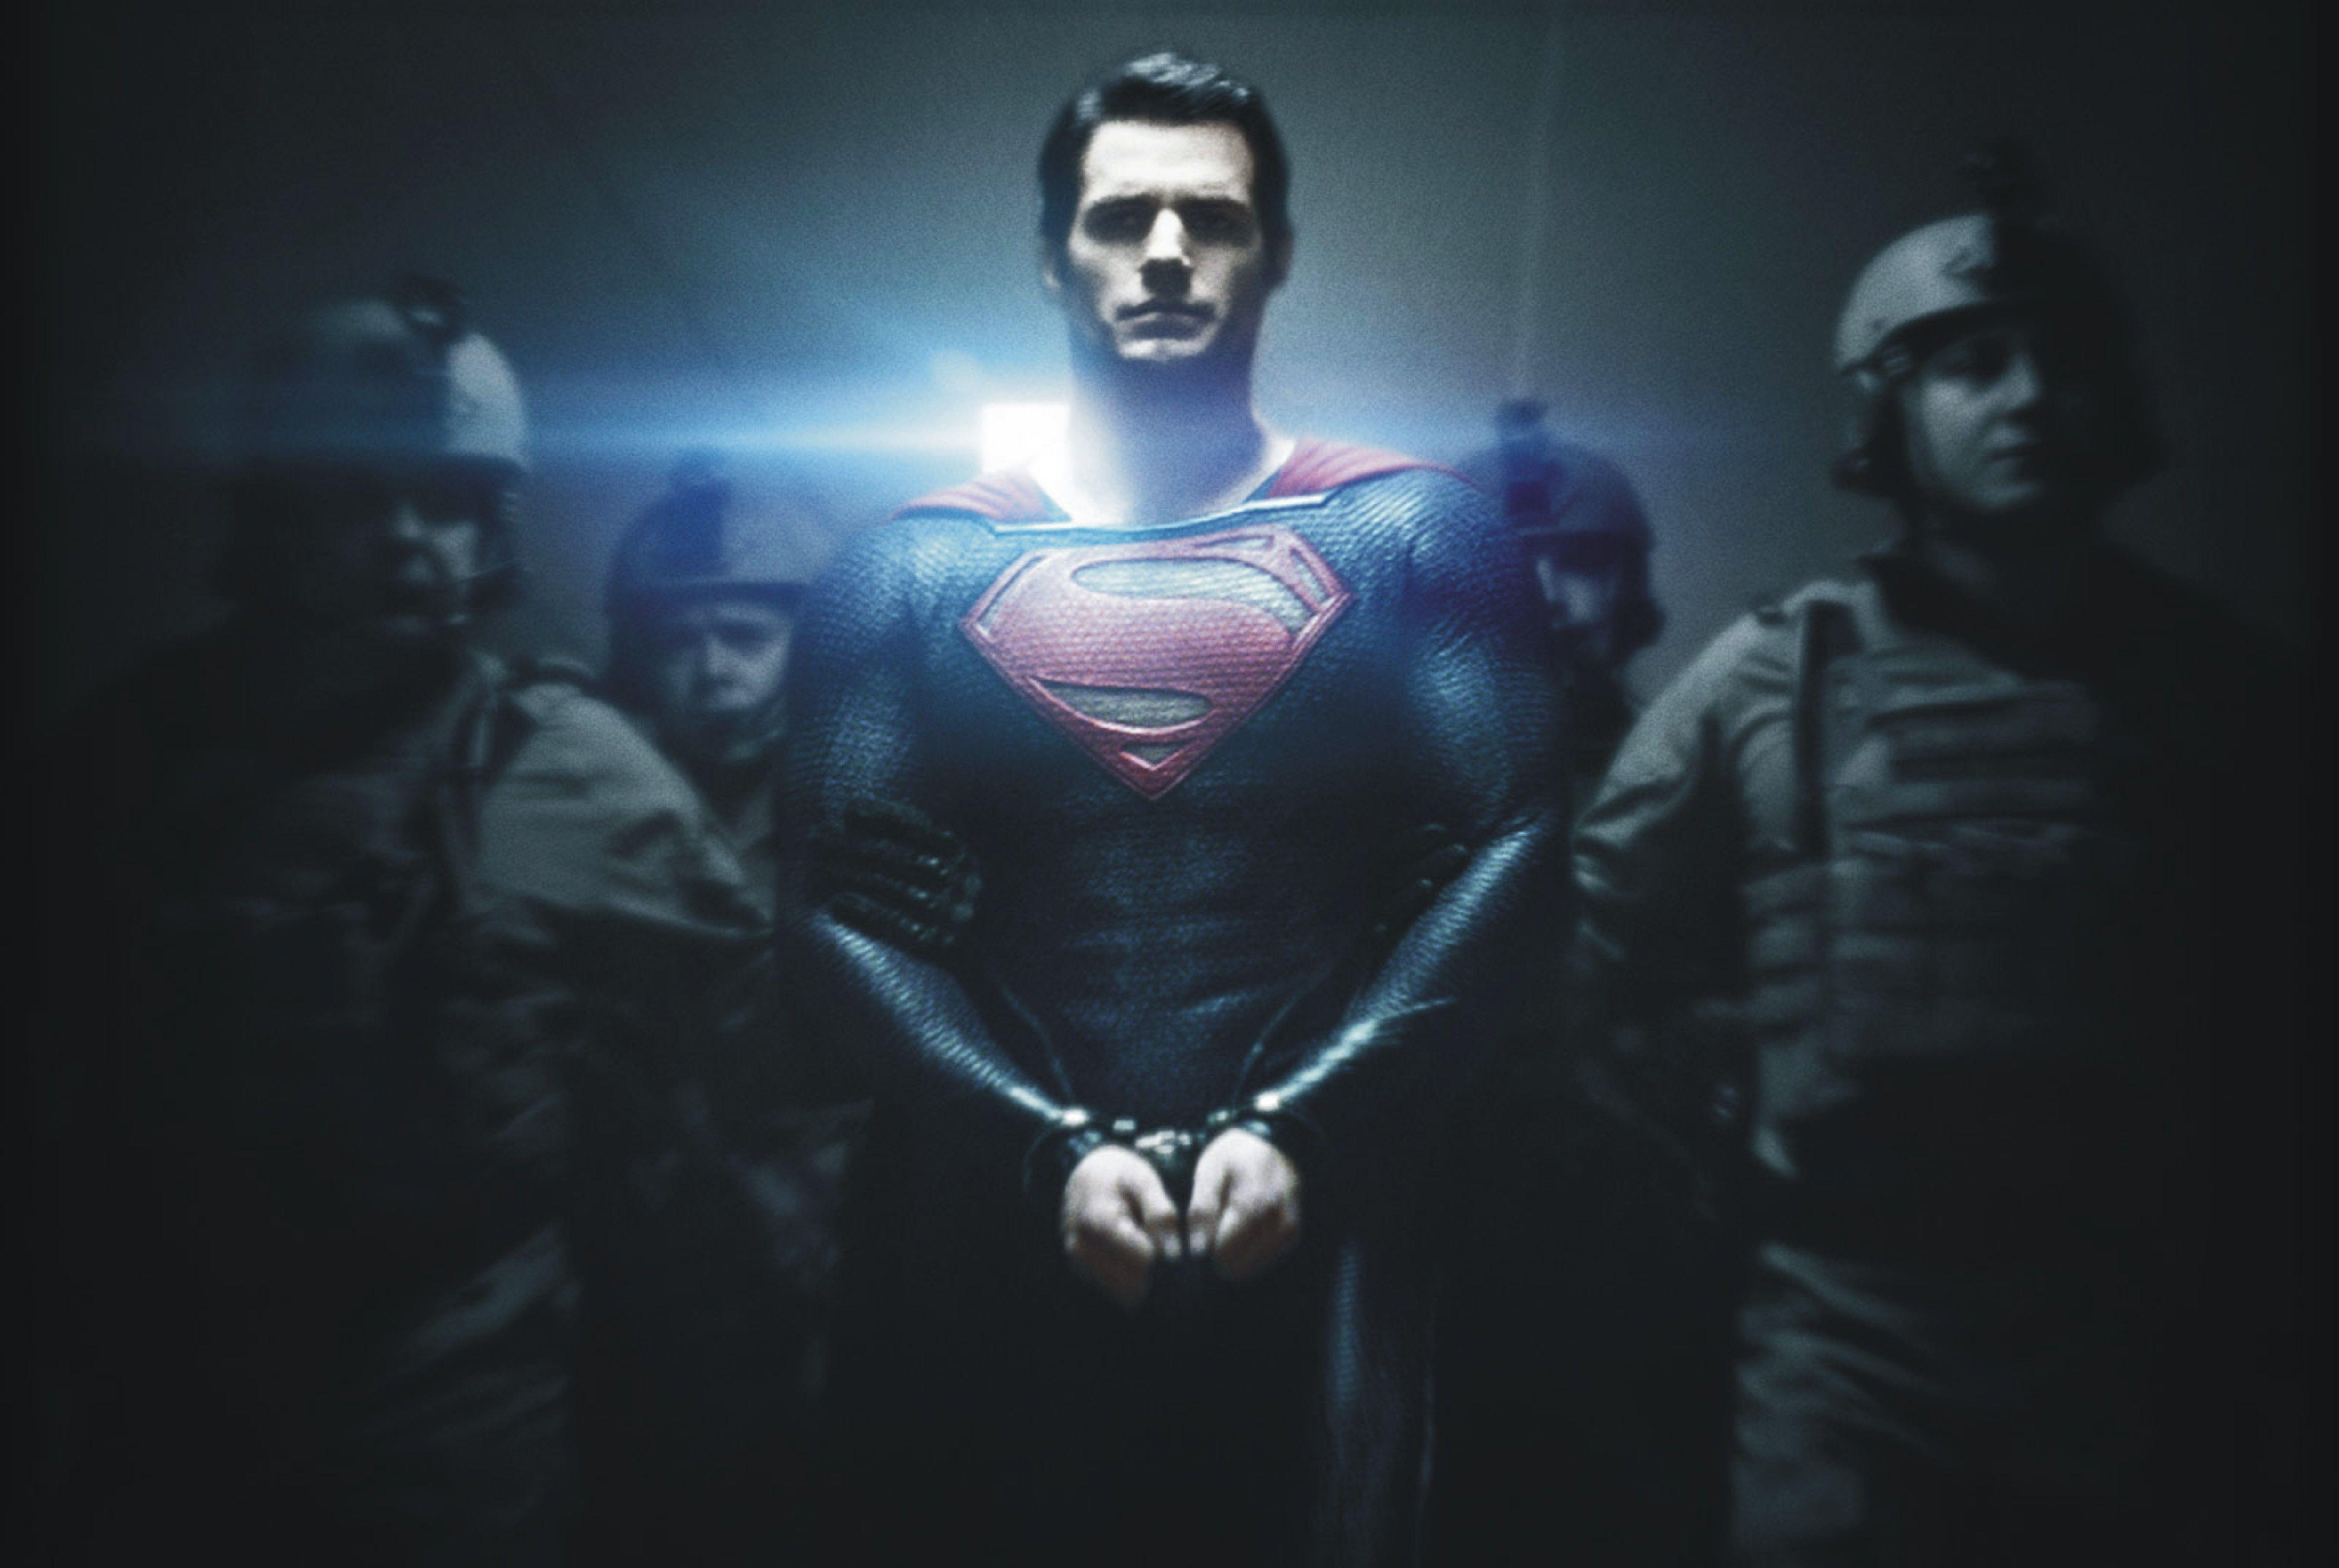 Man Of Steel Superman Wallpapers - Wallpaper Cave